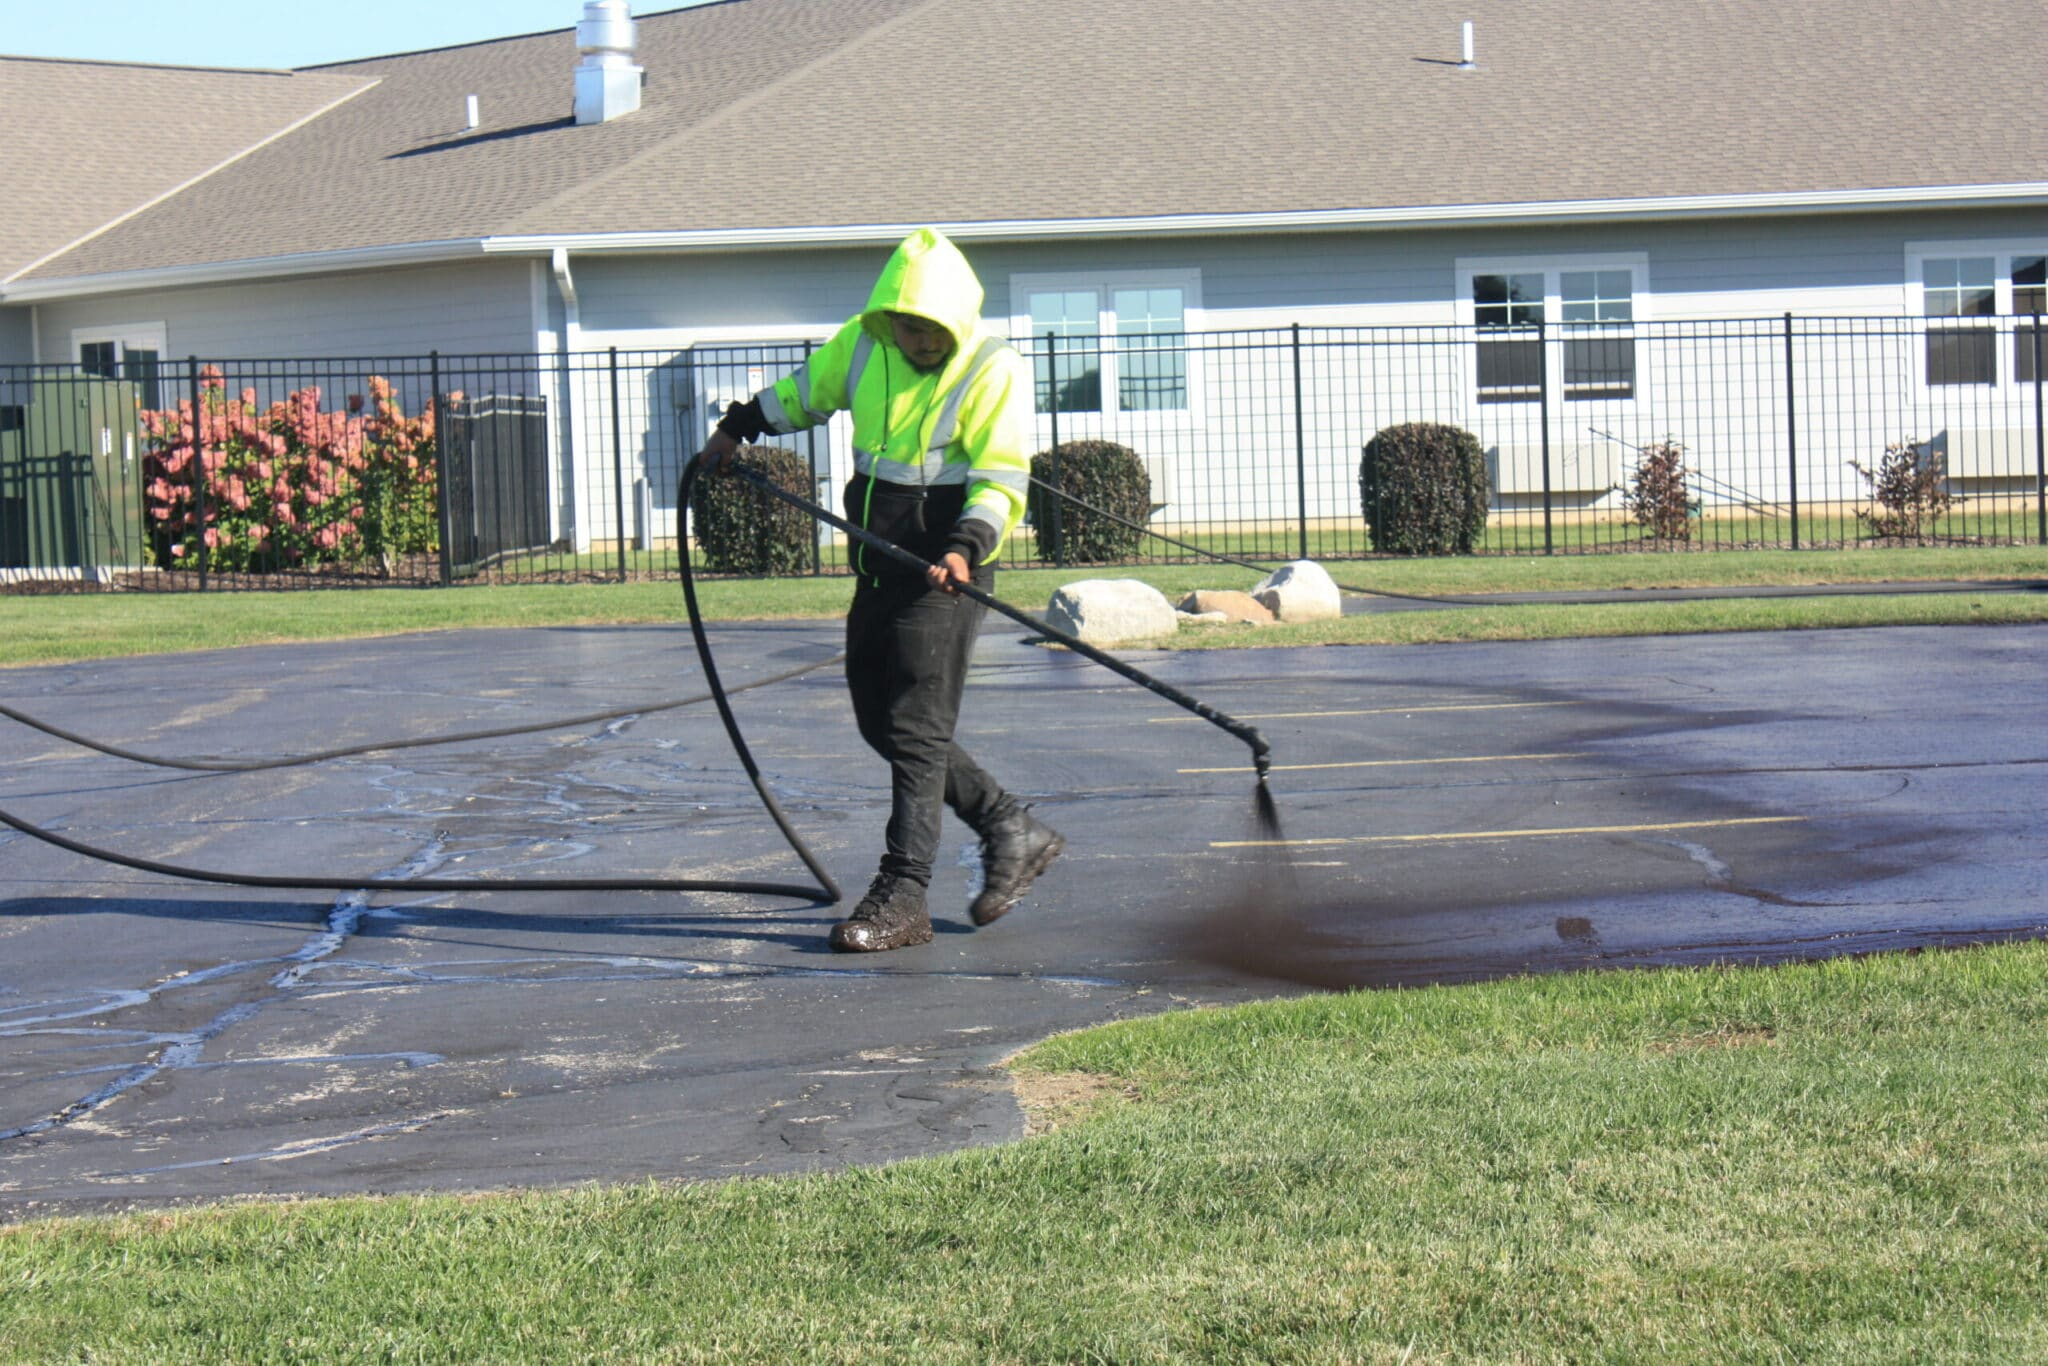 driveway sealing in racine, parking lot sealing in racine, cicchini asphalt